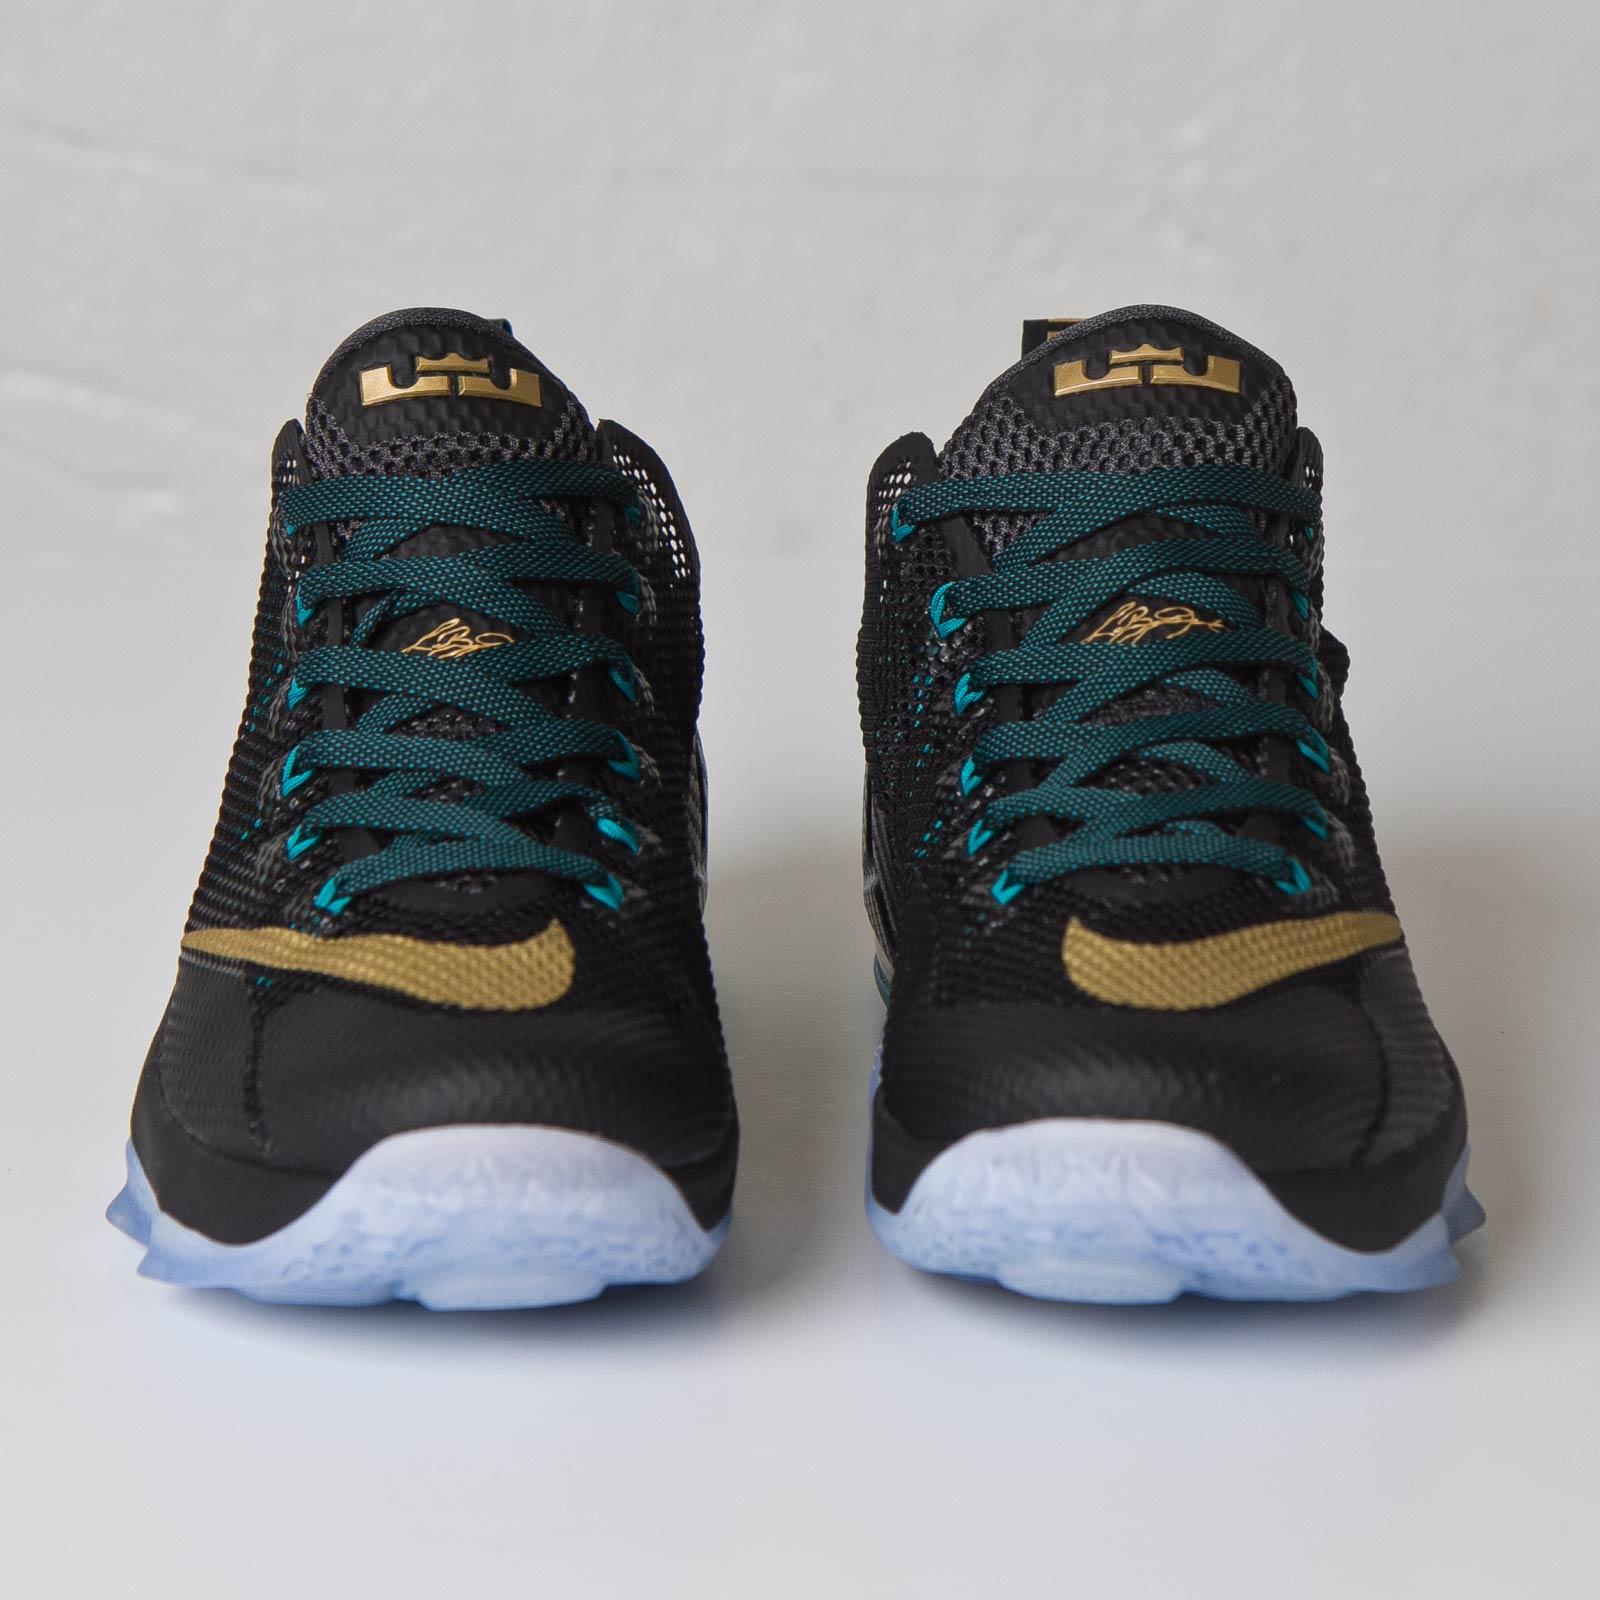 102ad8558c335 Nike Lebron XII Low - 724557-070 - Sneakersnstuff